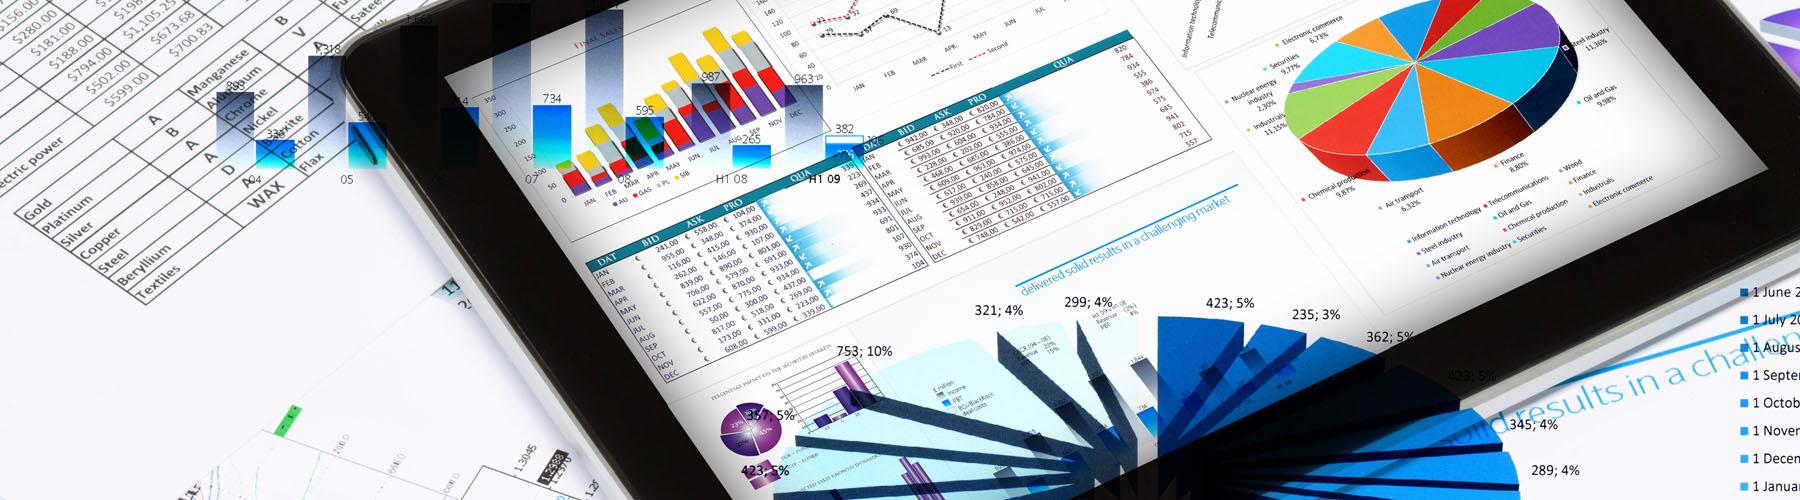 Energie-Management-Systeem-Cut